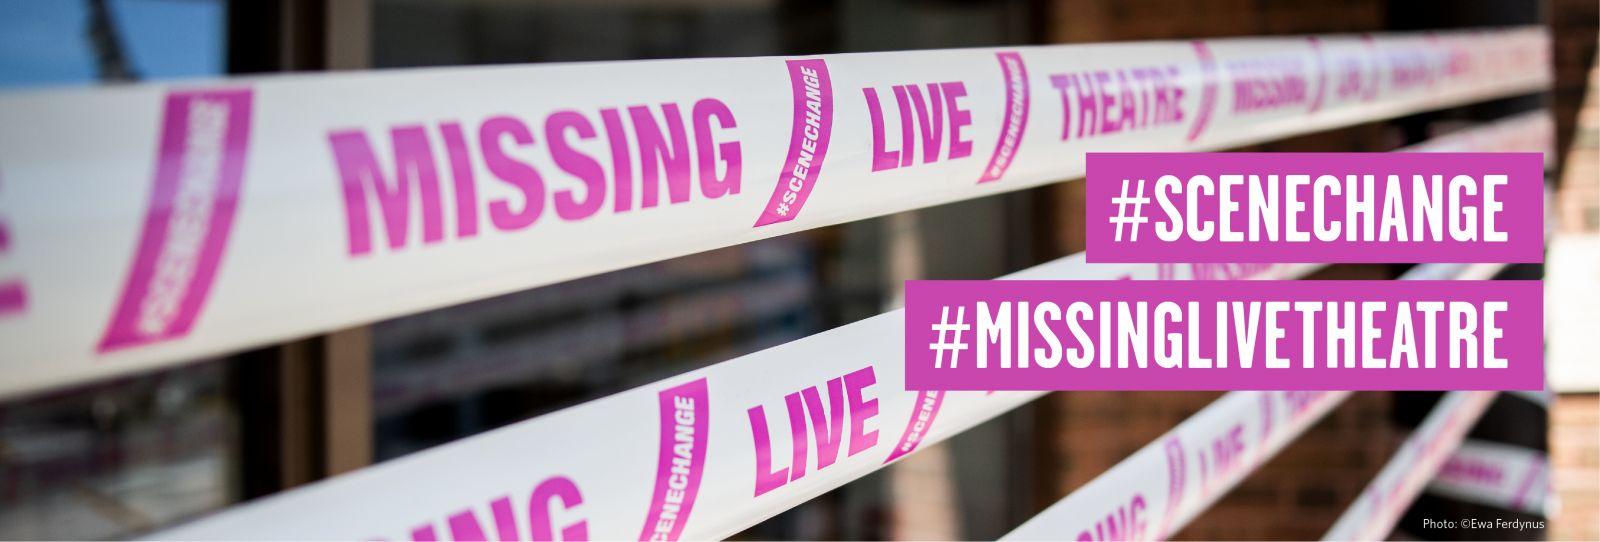 Rose Theatre joins Scene Change's #MissingLiveTheatre project